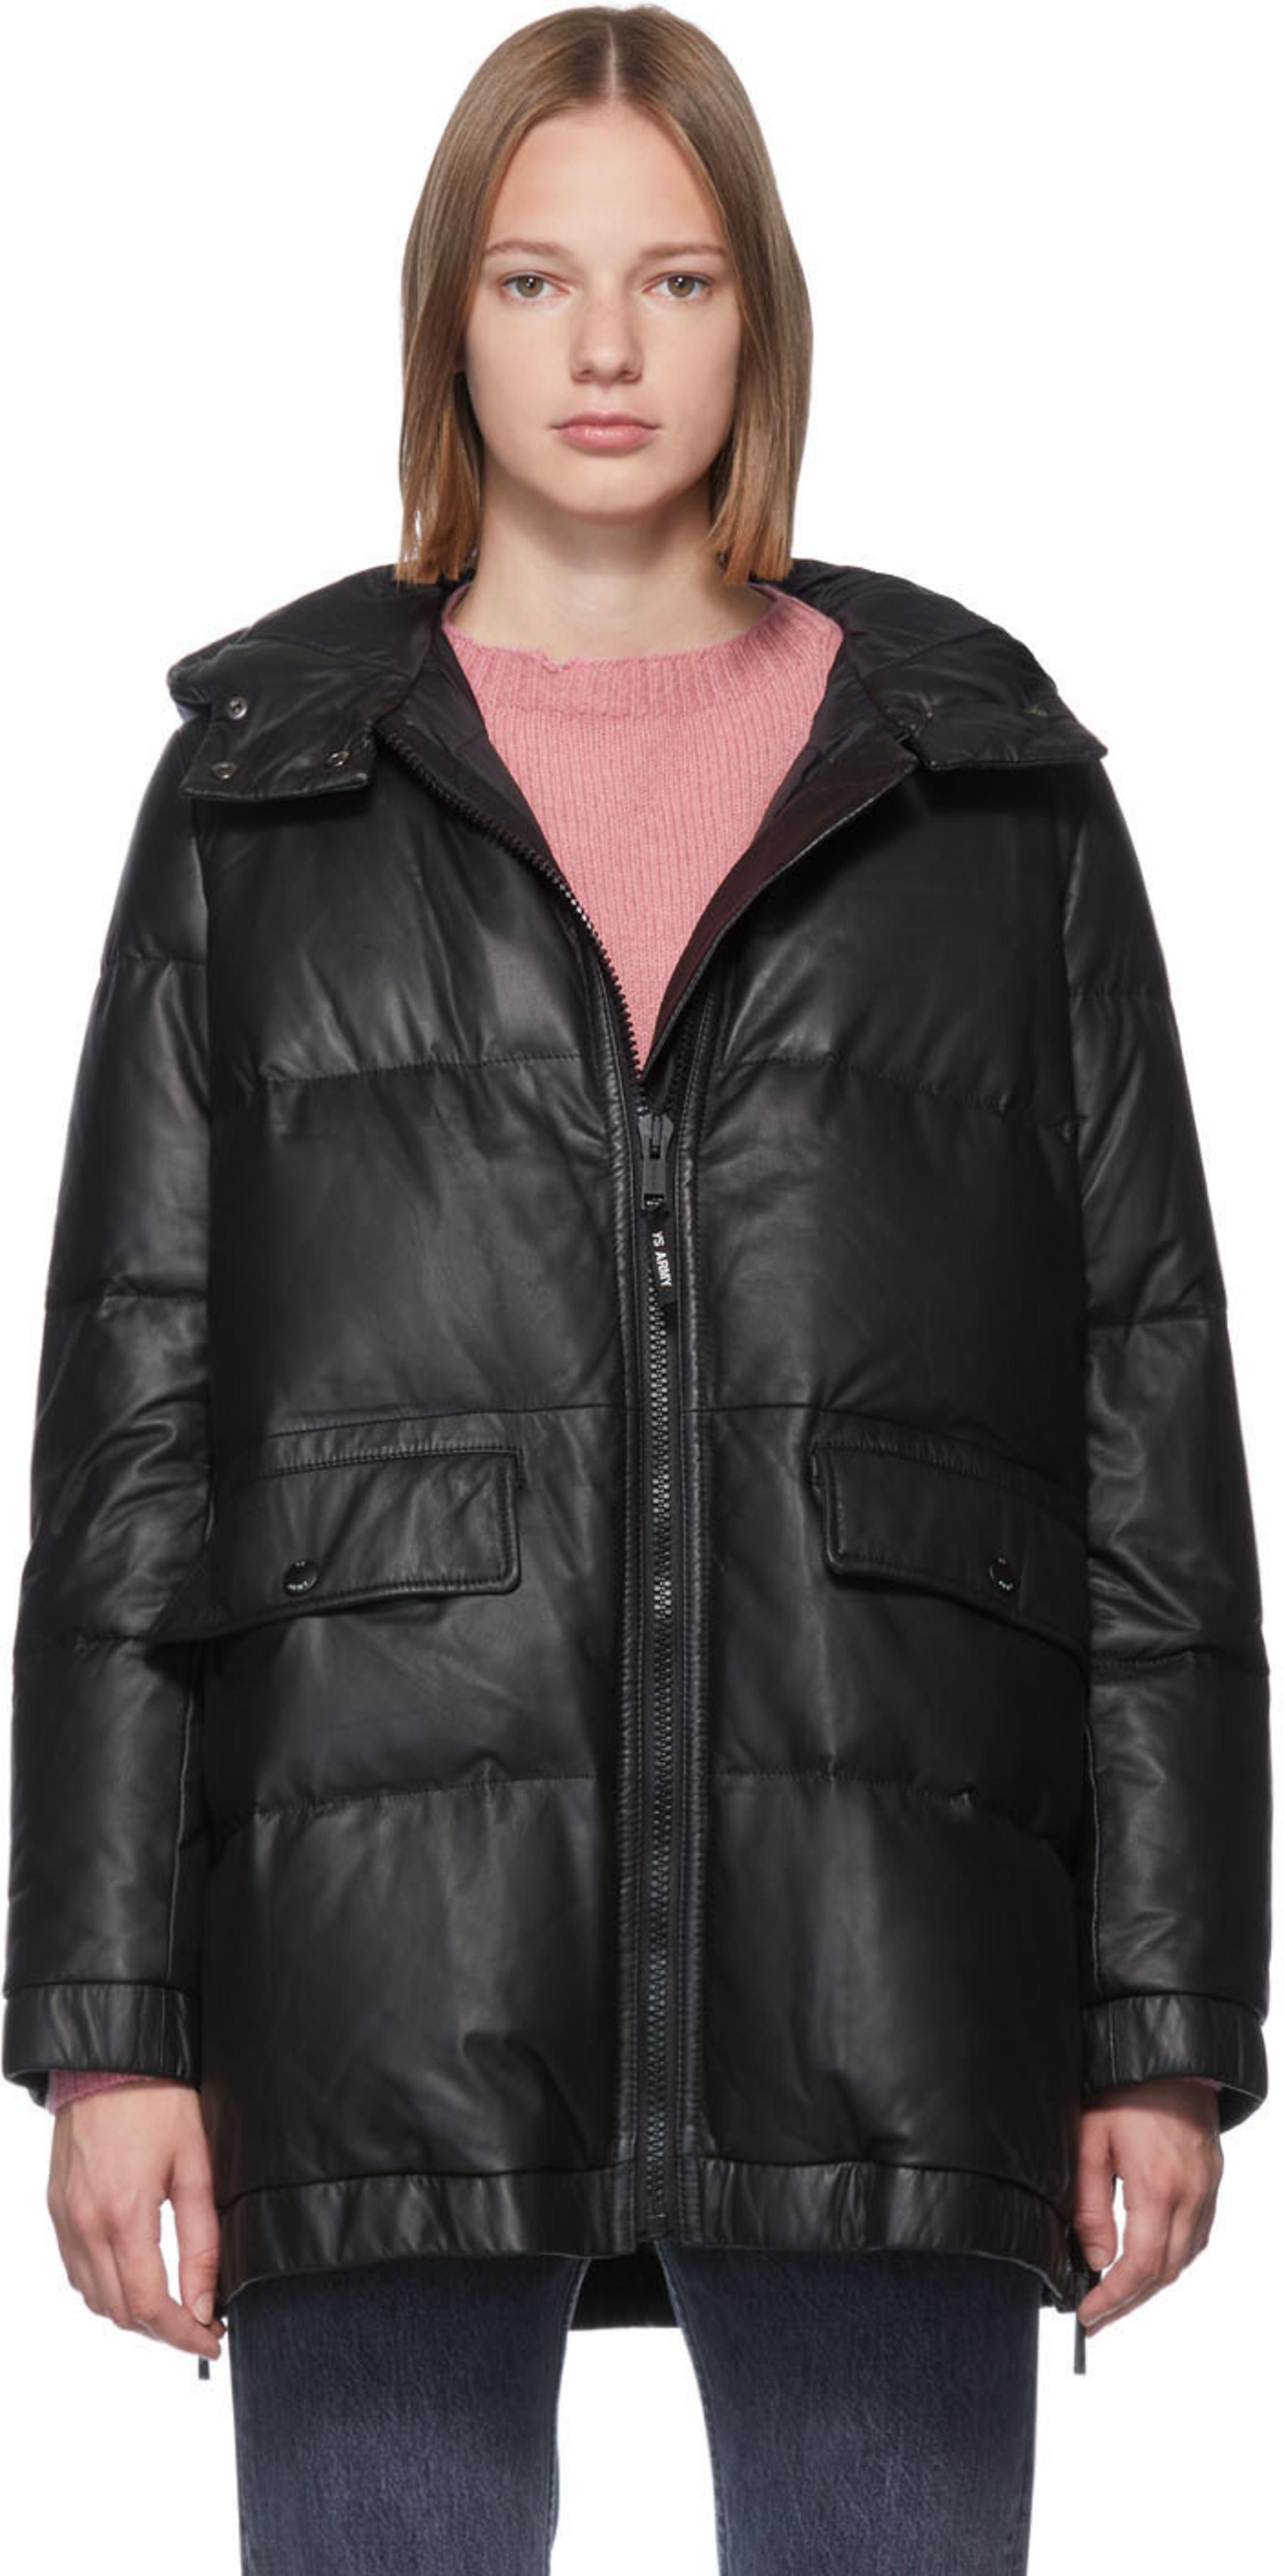 803db508 Black Down Leather Doudoune Jacket